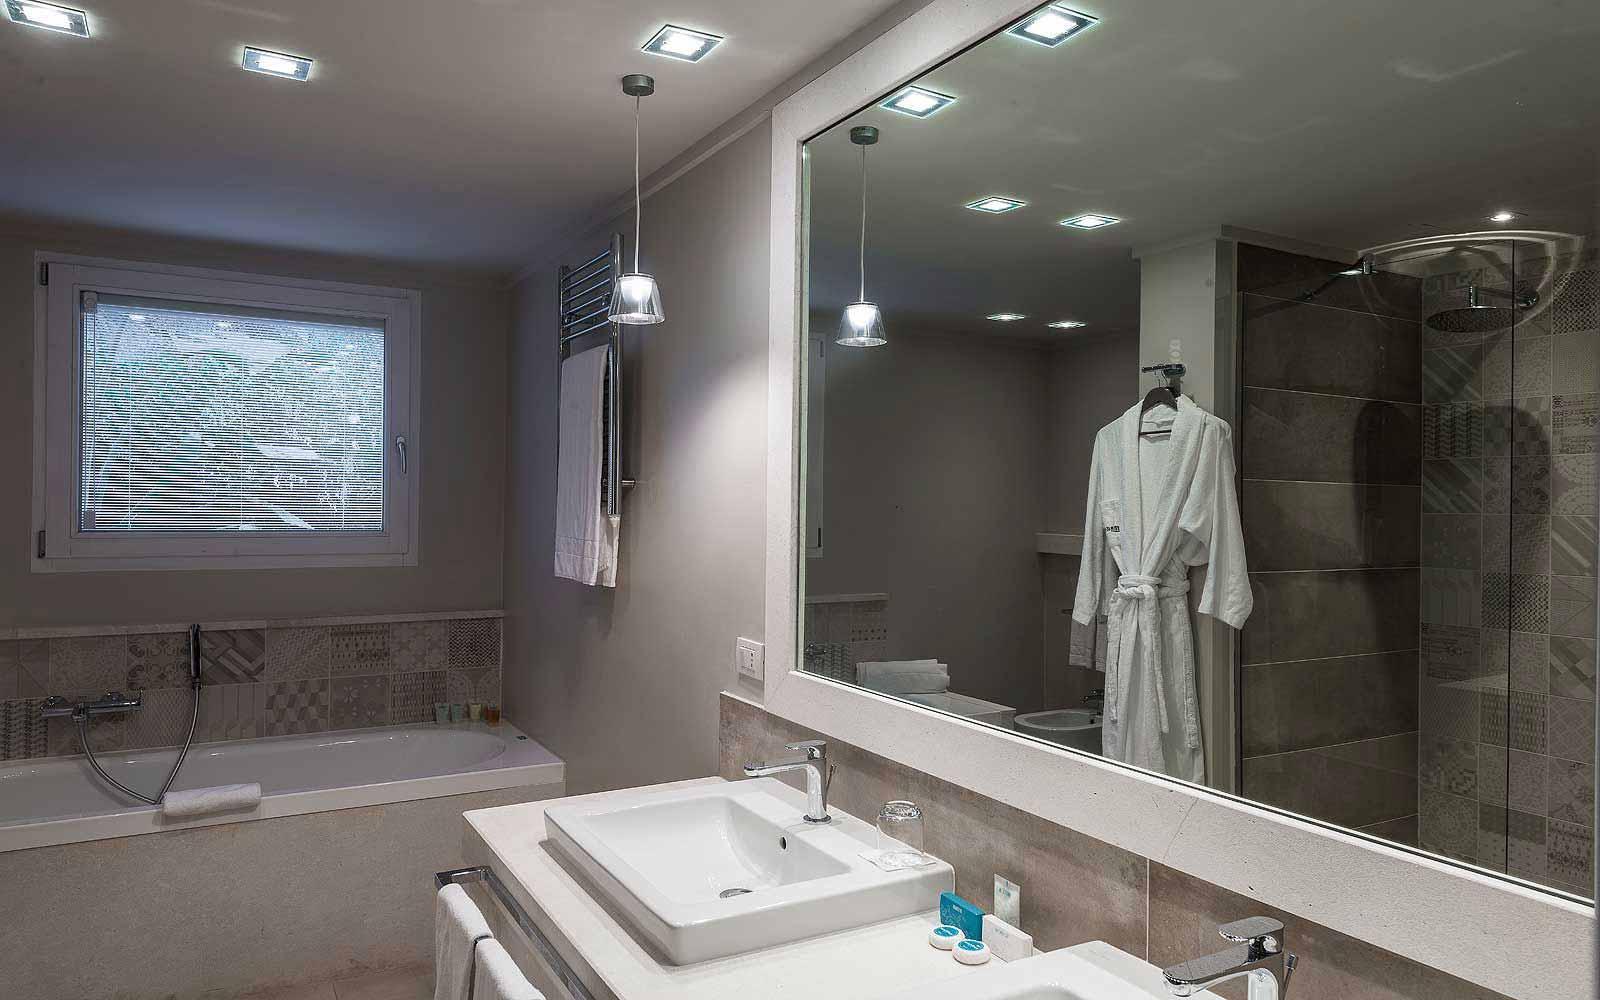 Bathroom of a deluxe bungalow at Forte Village Il Borgo